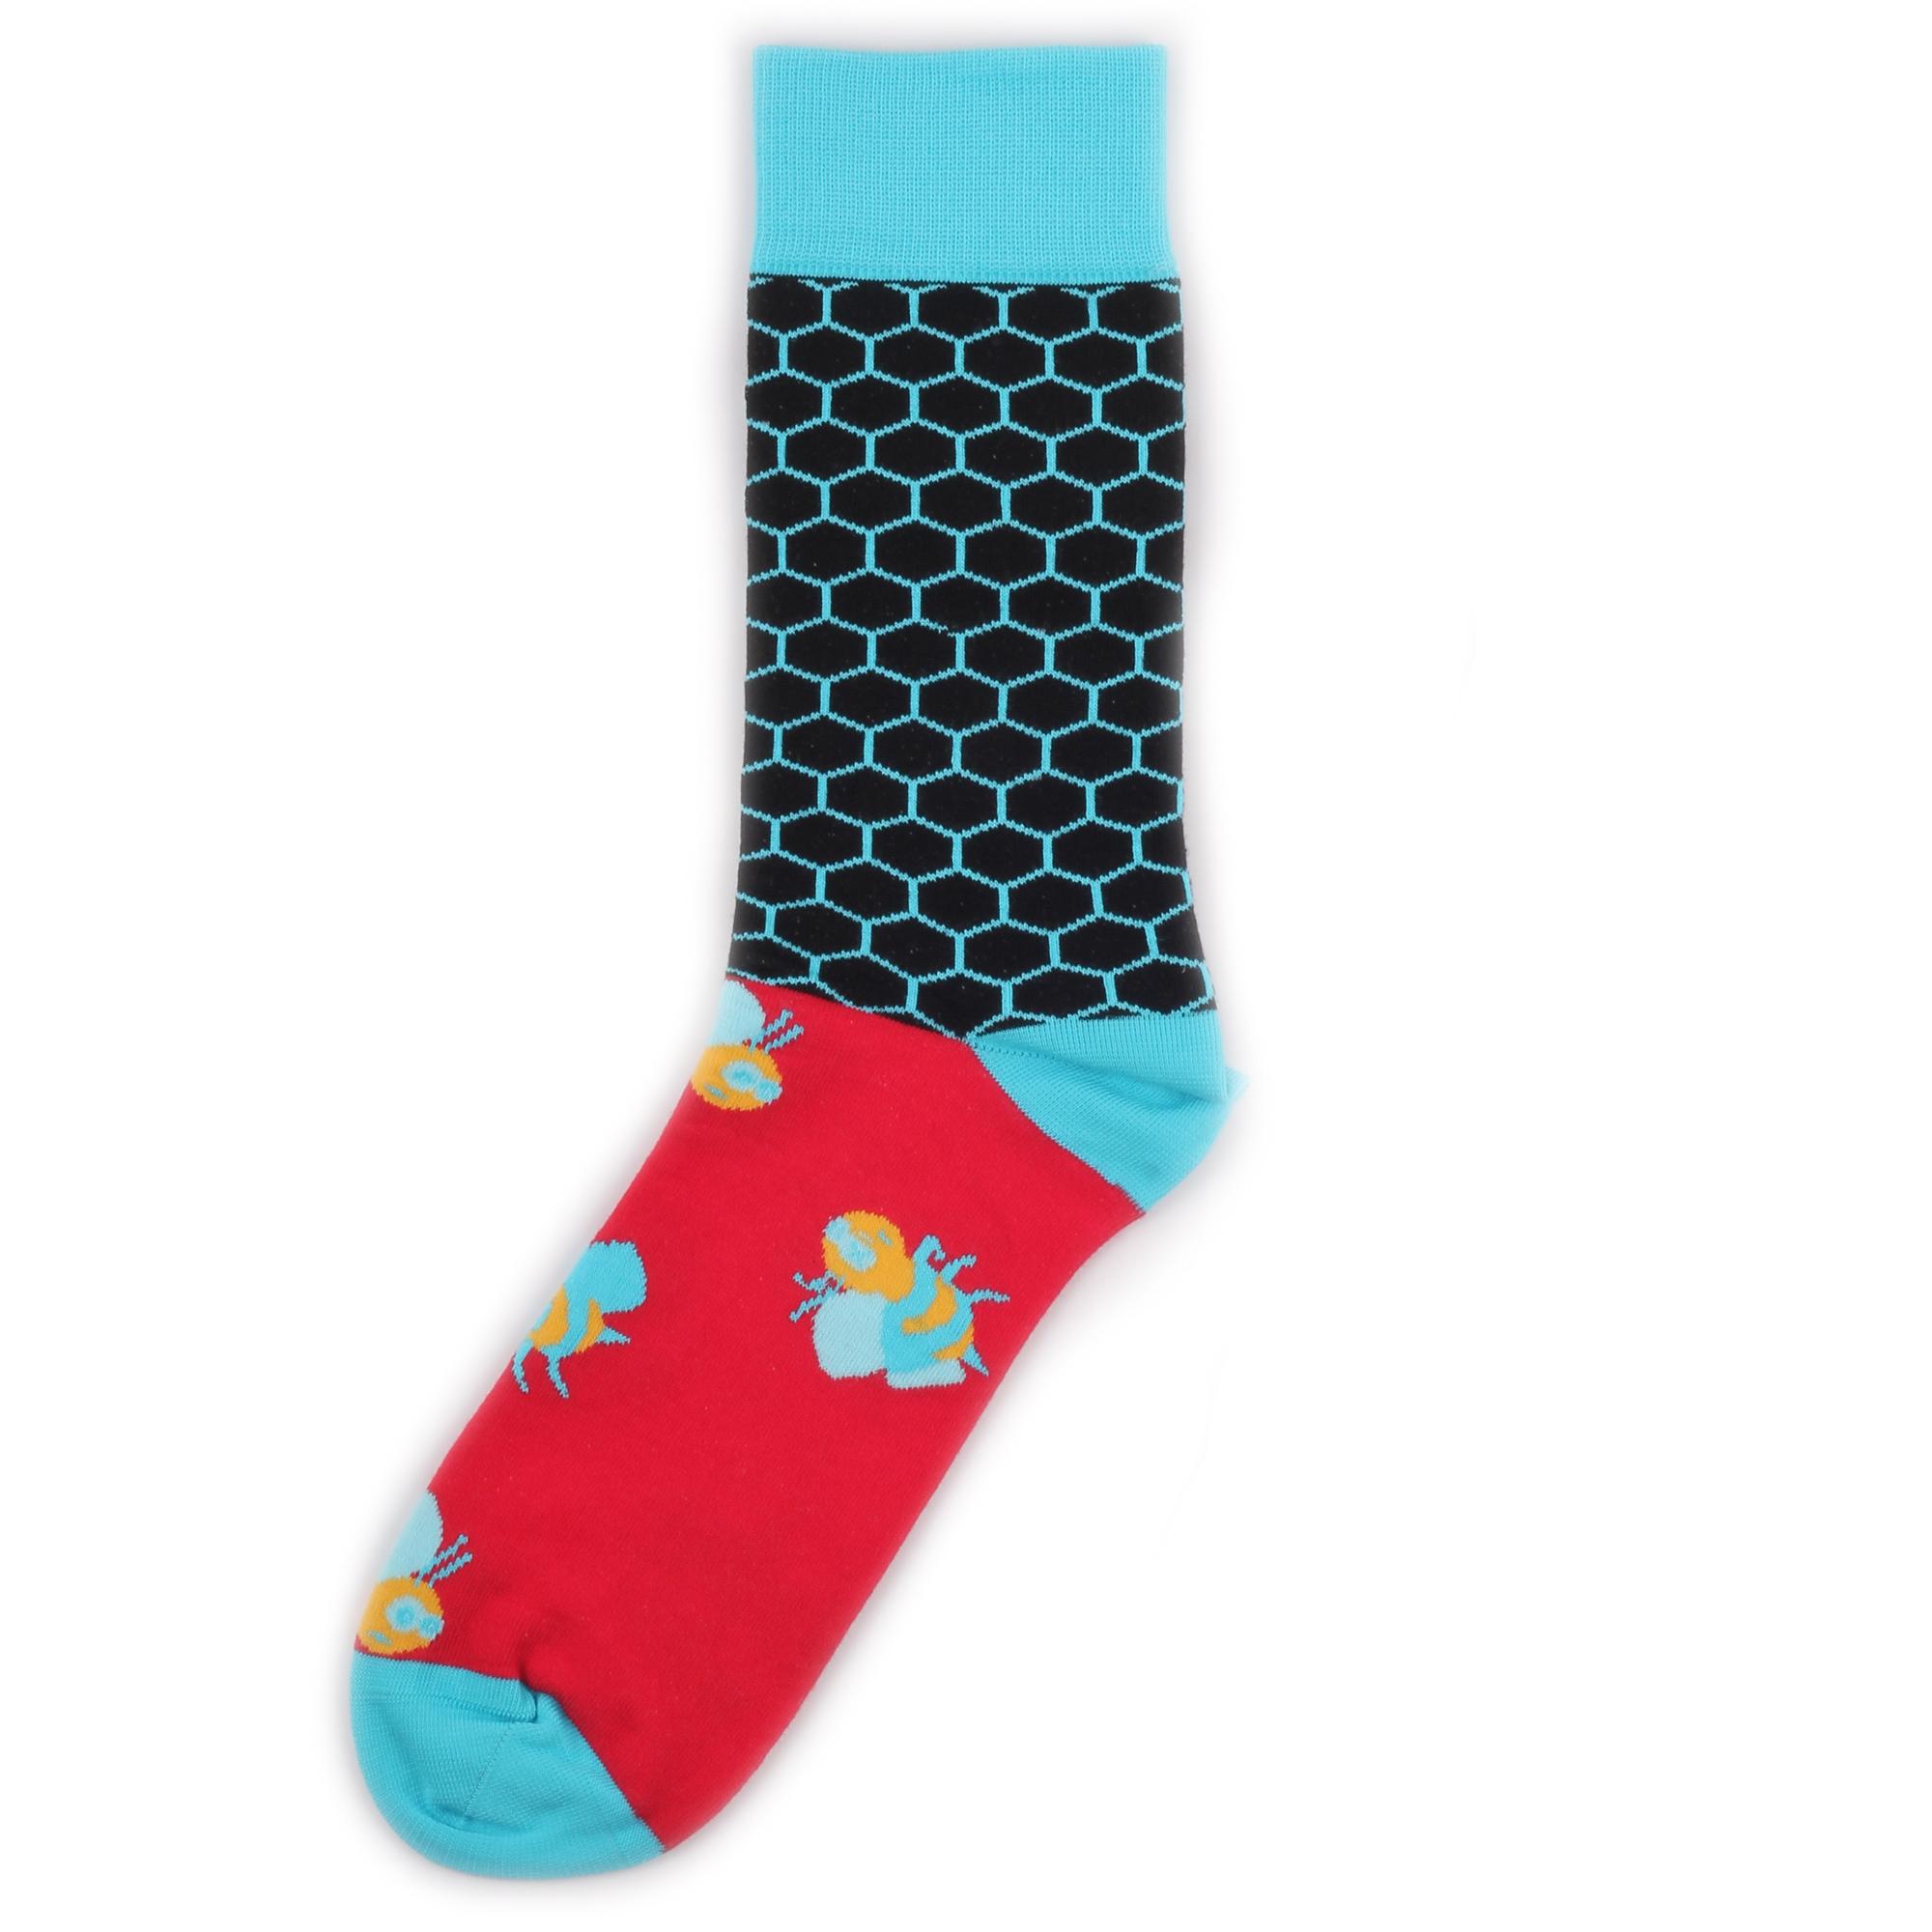 Носки унисекс St.Friday Socks BH_BeesRedBlue разноцветные 39-41